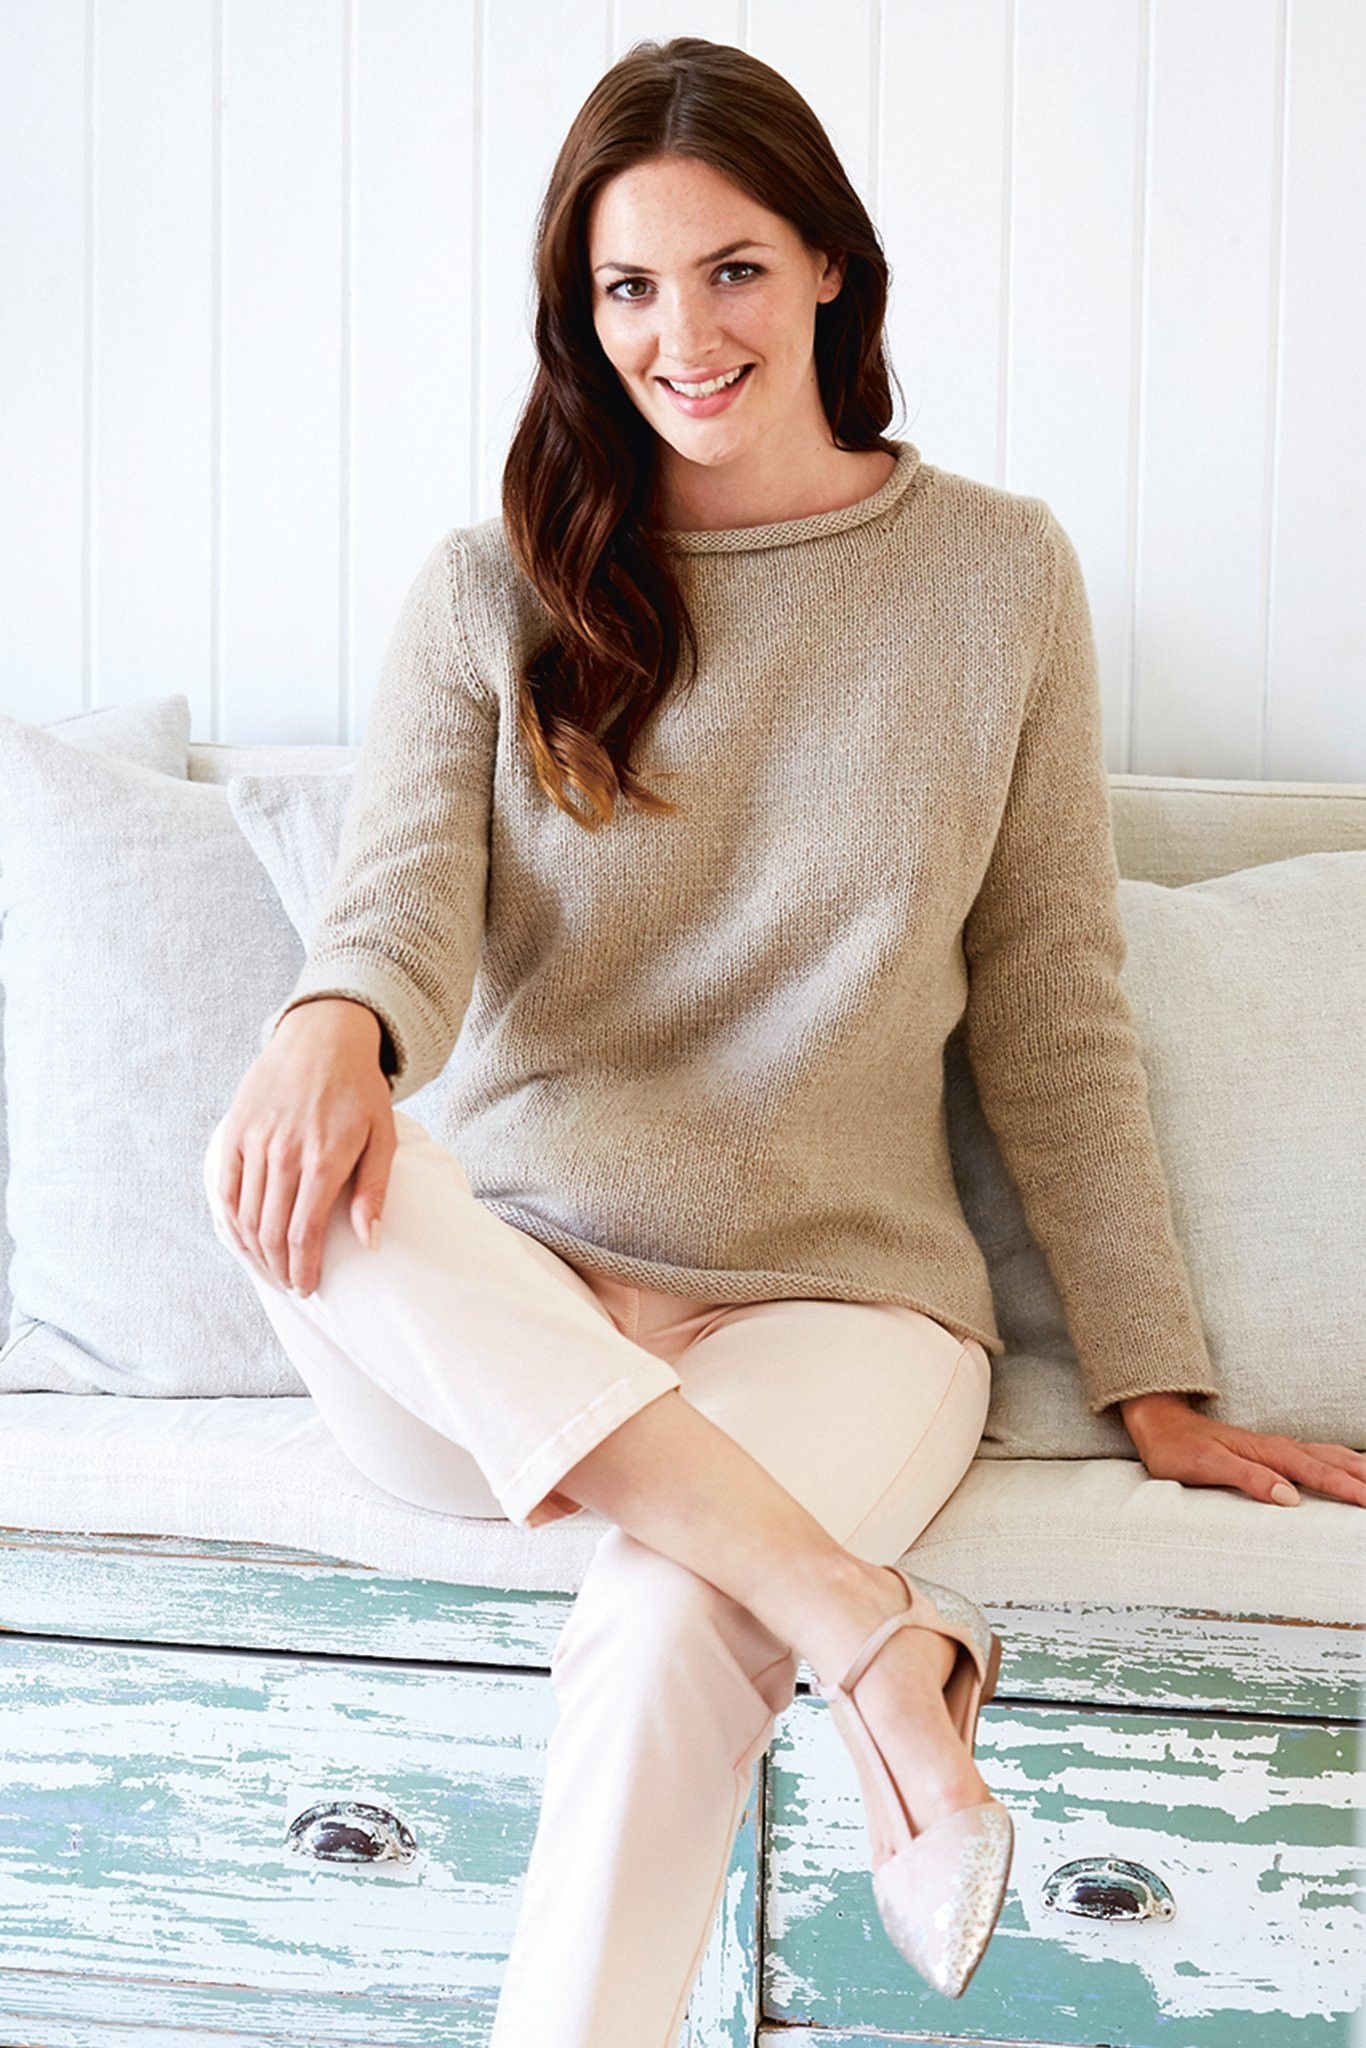 Classic Ladies Jumper Knitting Pattern | The Knitting Network